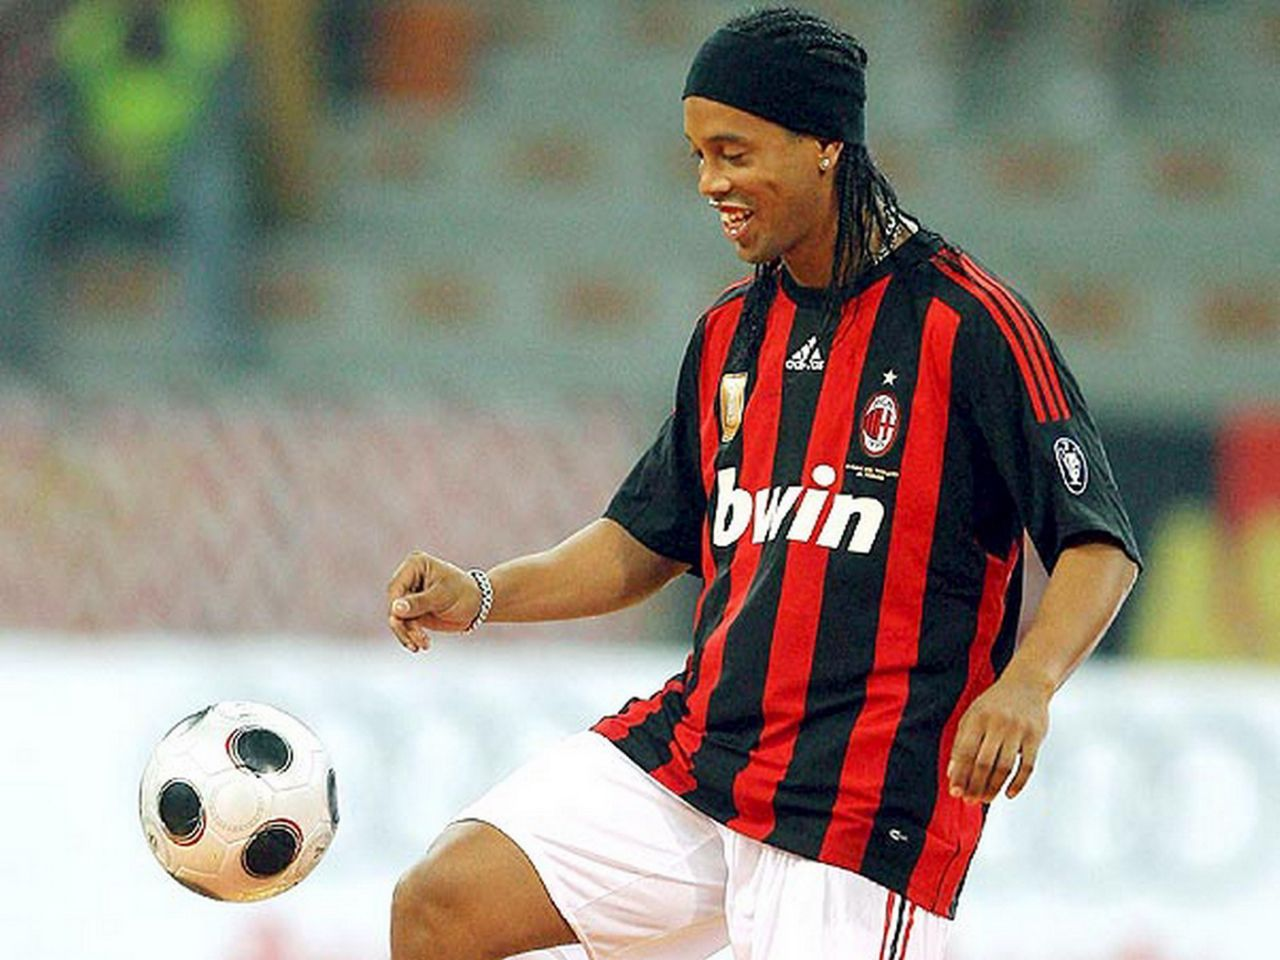 Index of var albums SoccerPlayers RonaldinhoGaucho 1024